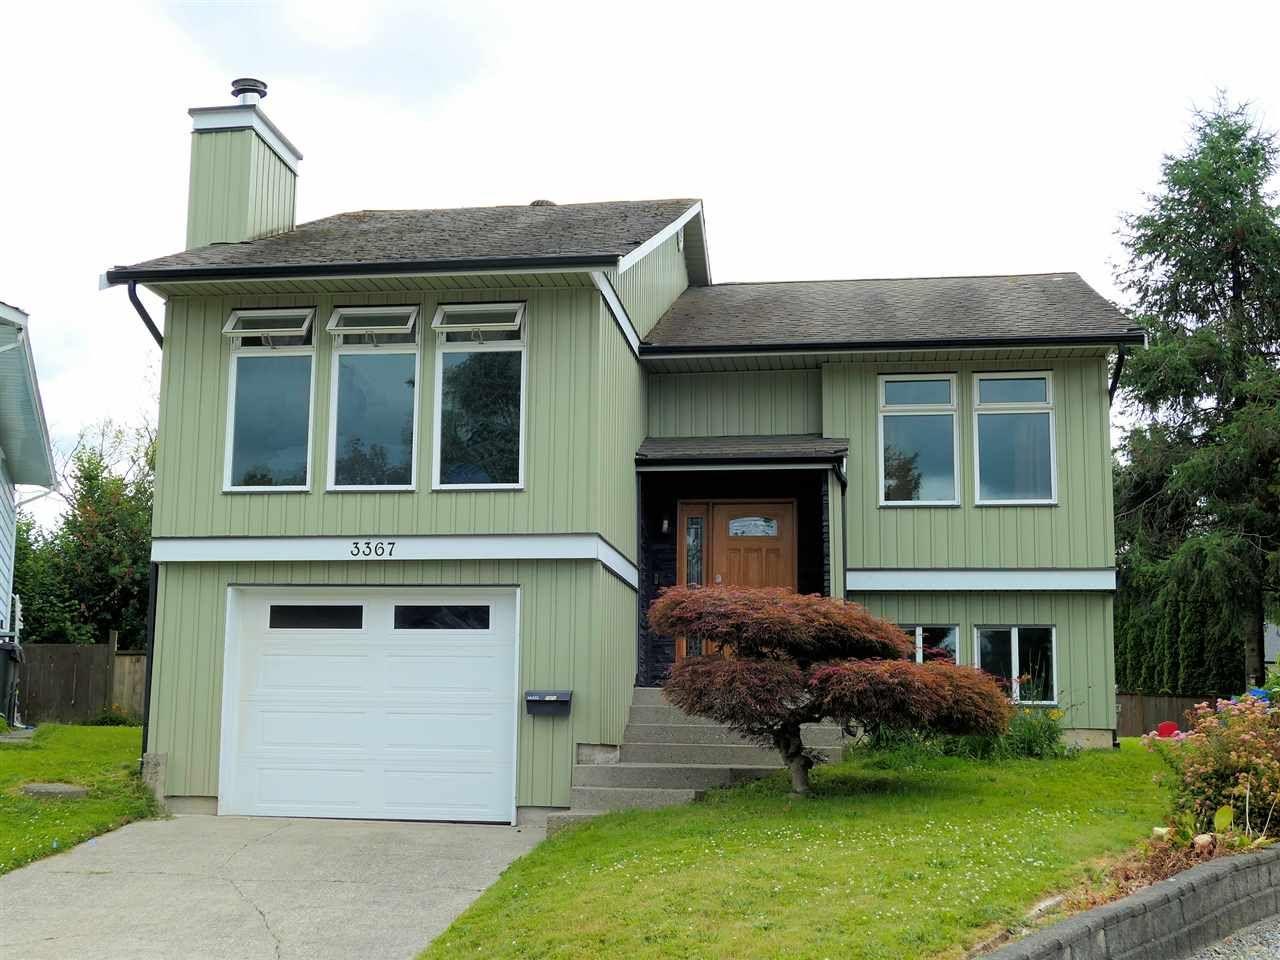 Main Photo: 3367 271B Street in Langley: Aldergrove Langley House for sale : MLS®# R2387797